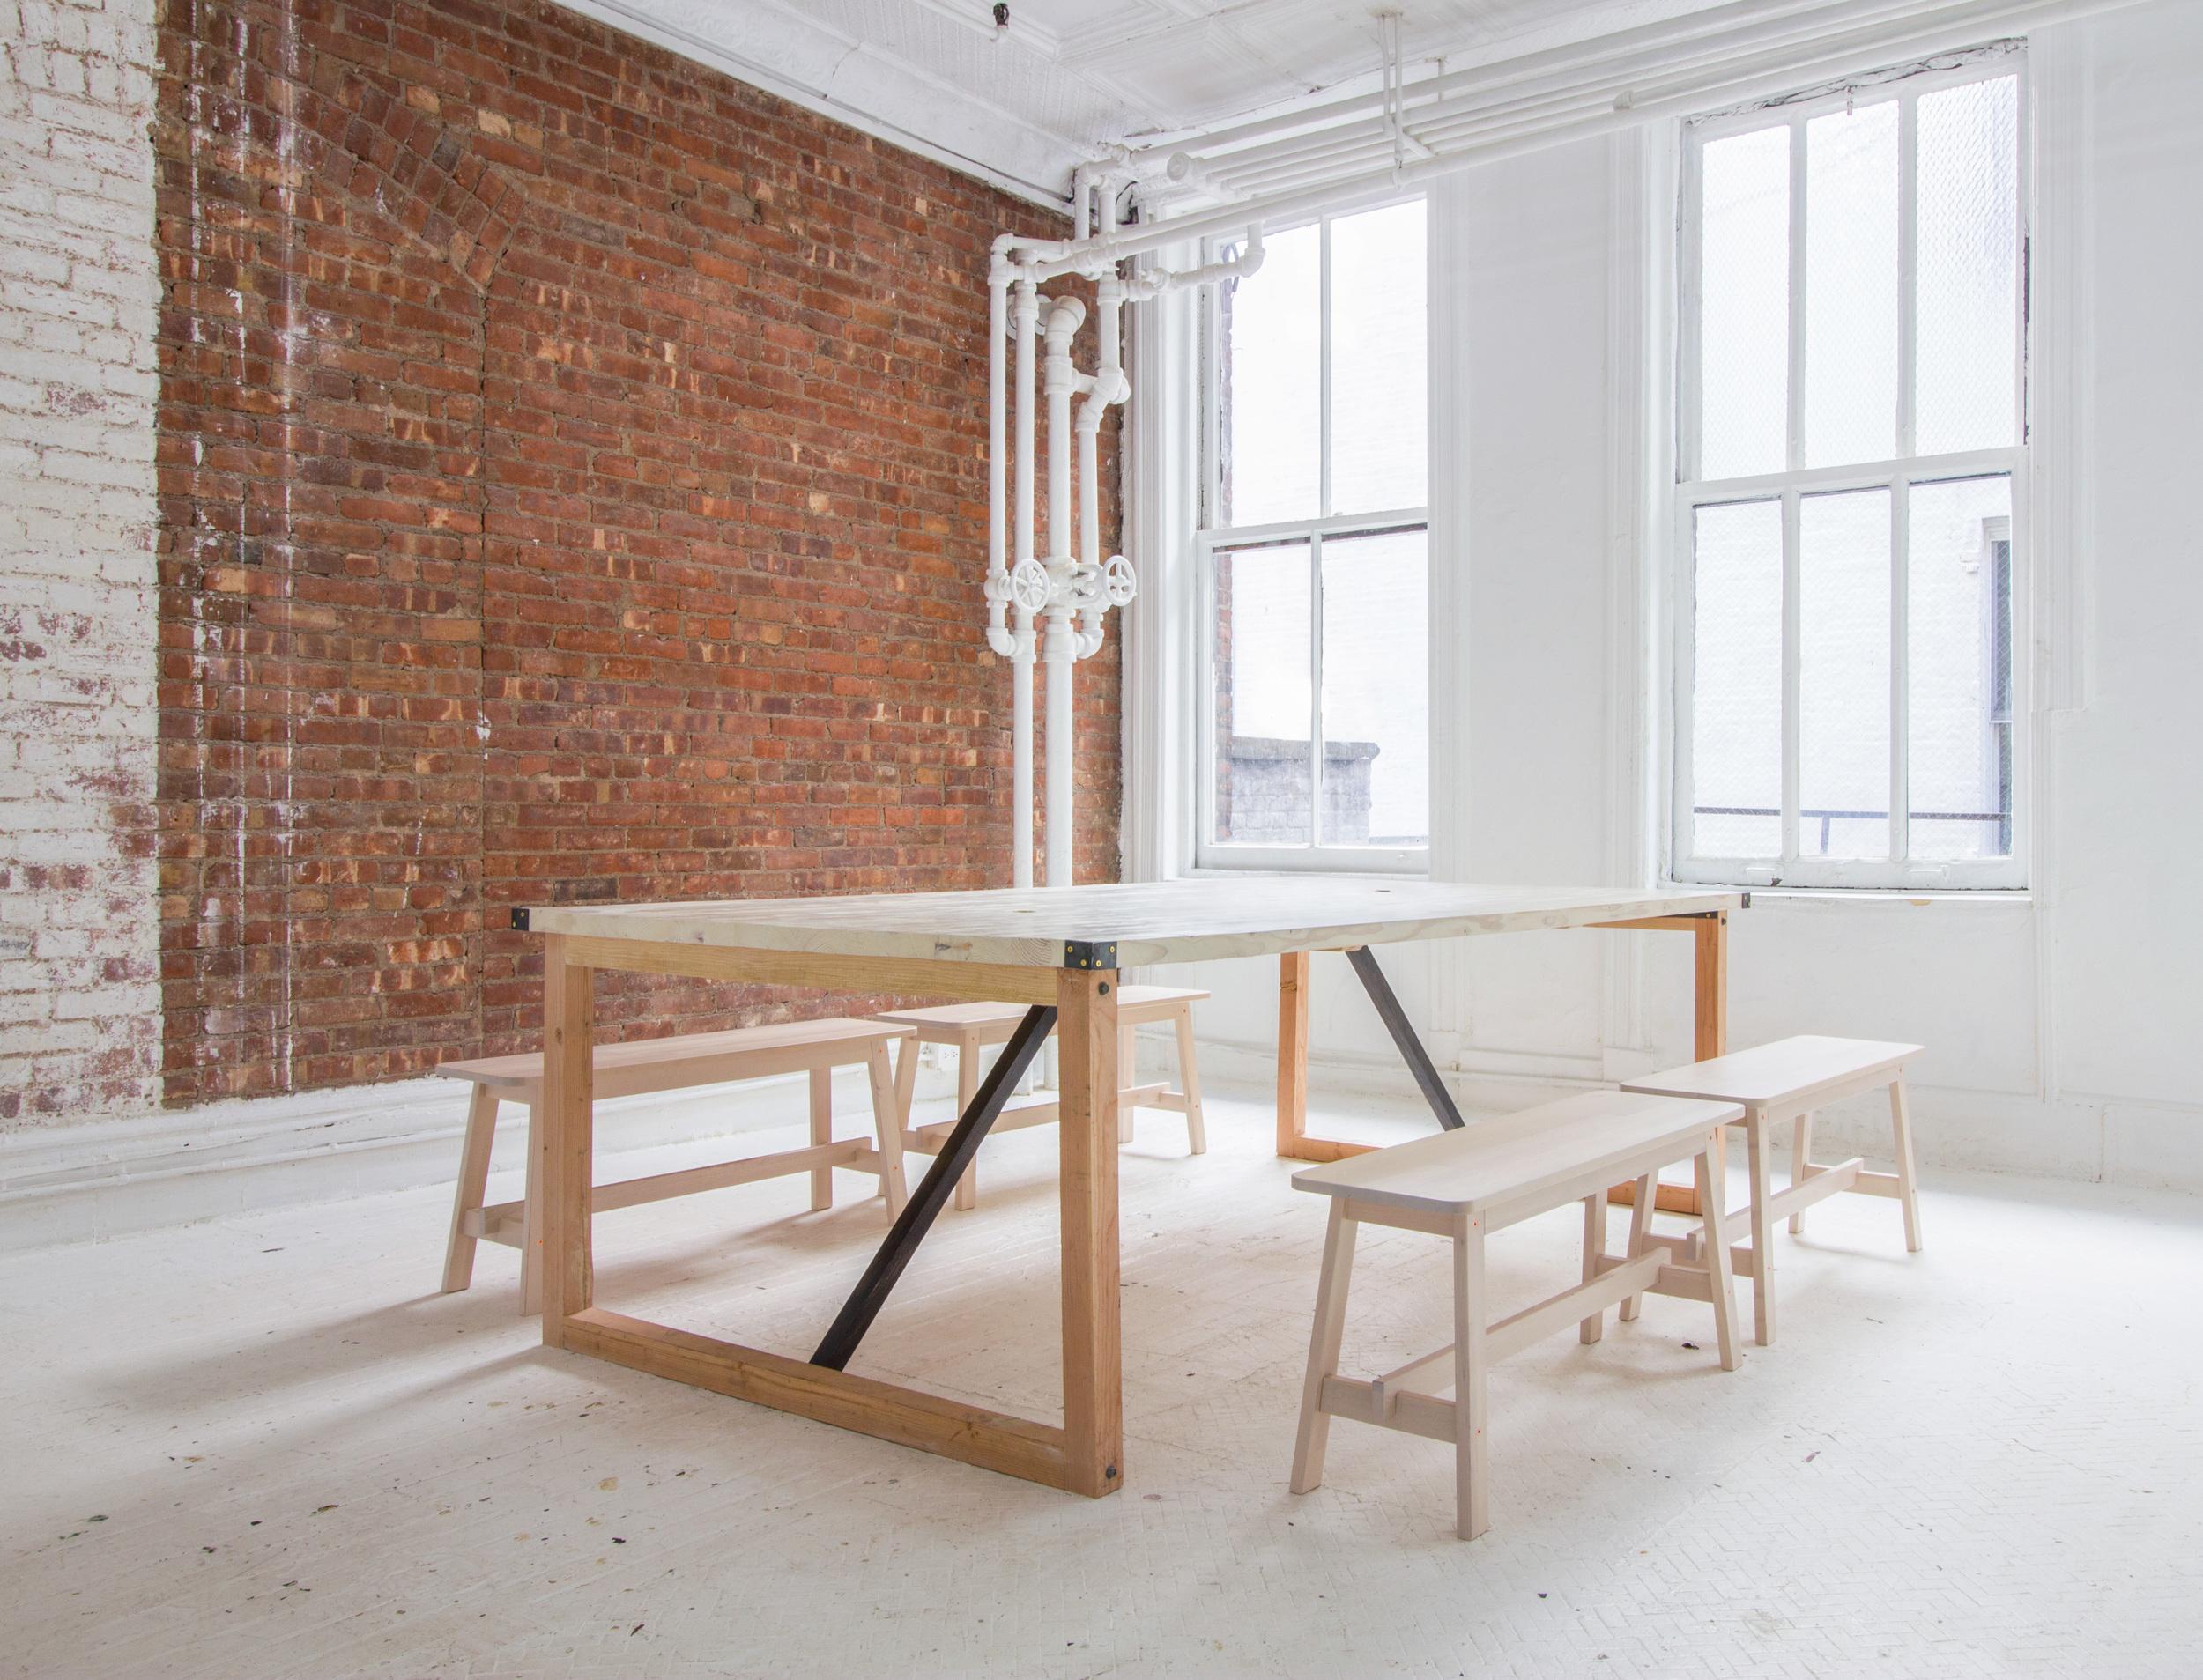 Homemade Startup Table